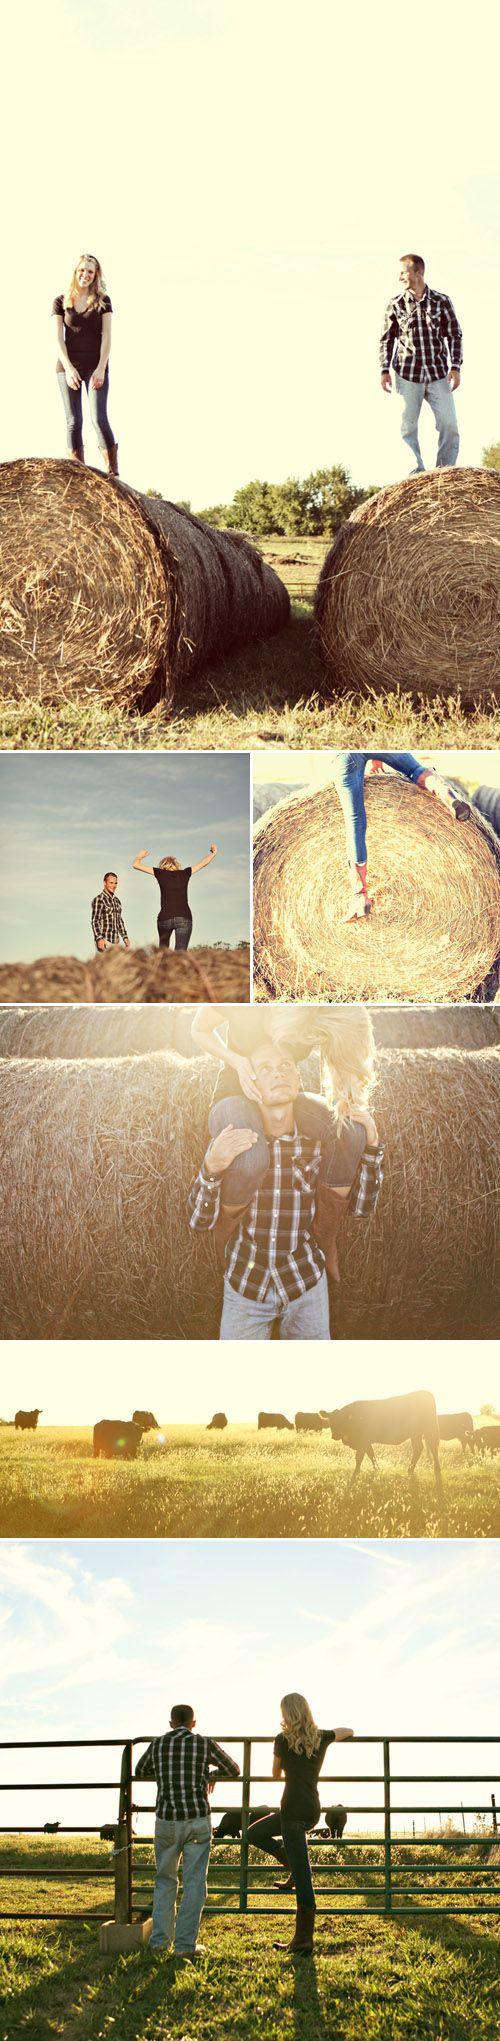 great engagement photo idea!